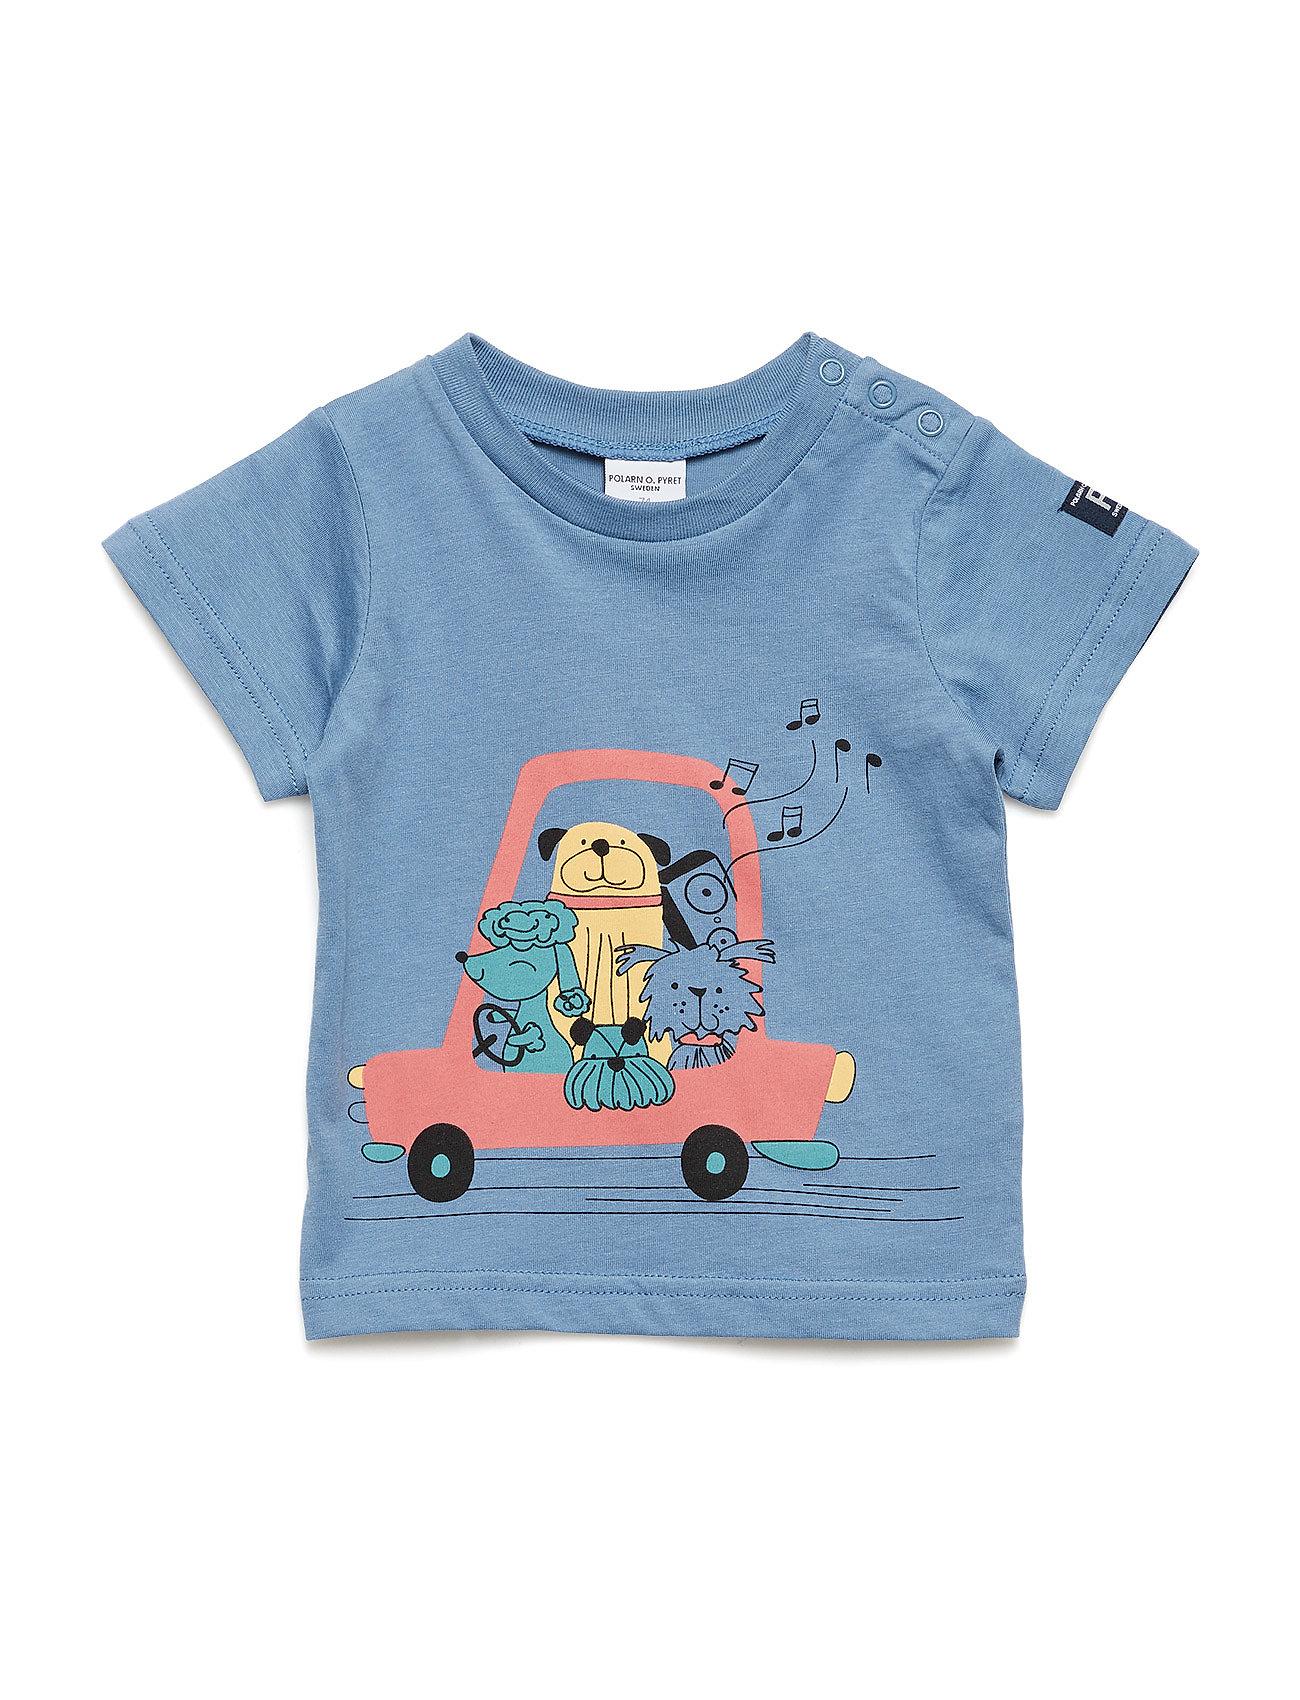 Polarn O. Pyret T-Shirt Short Sleeve Printed Baby